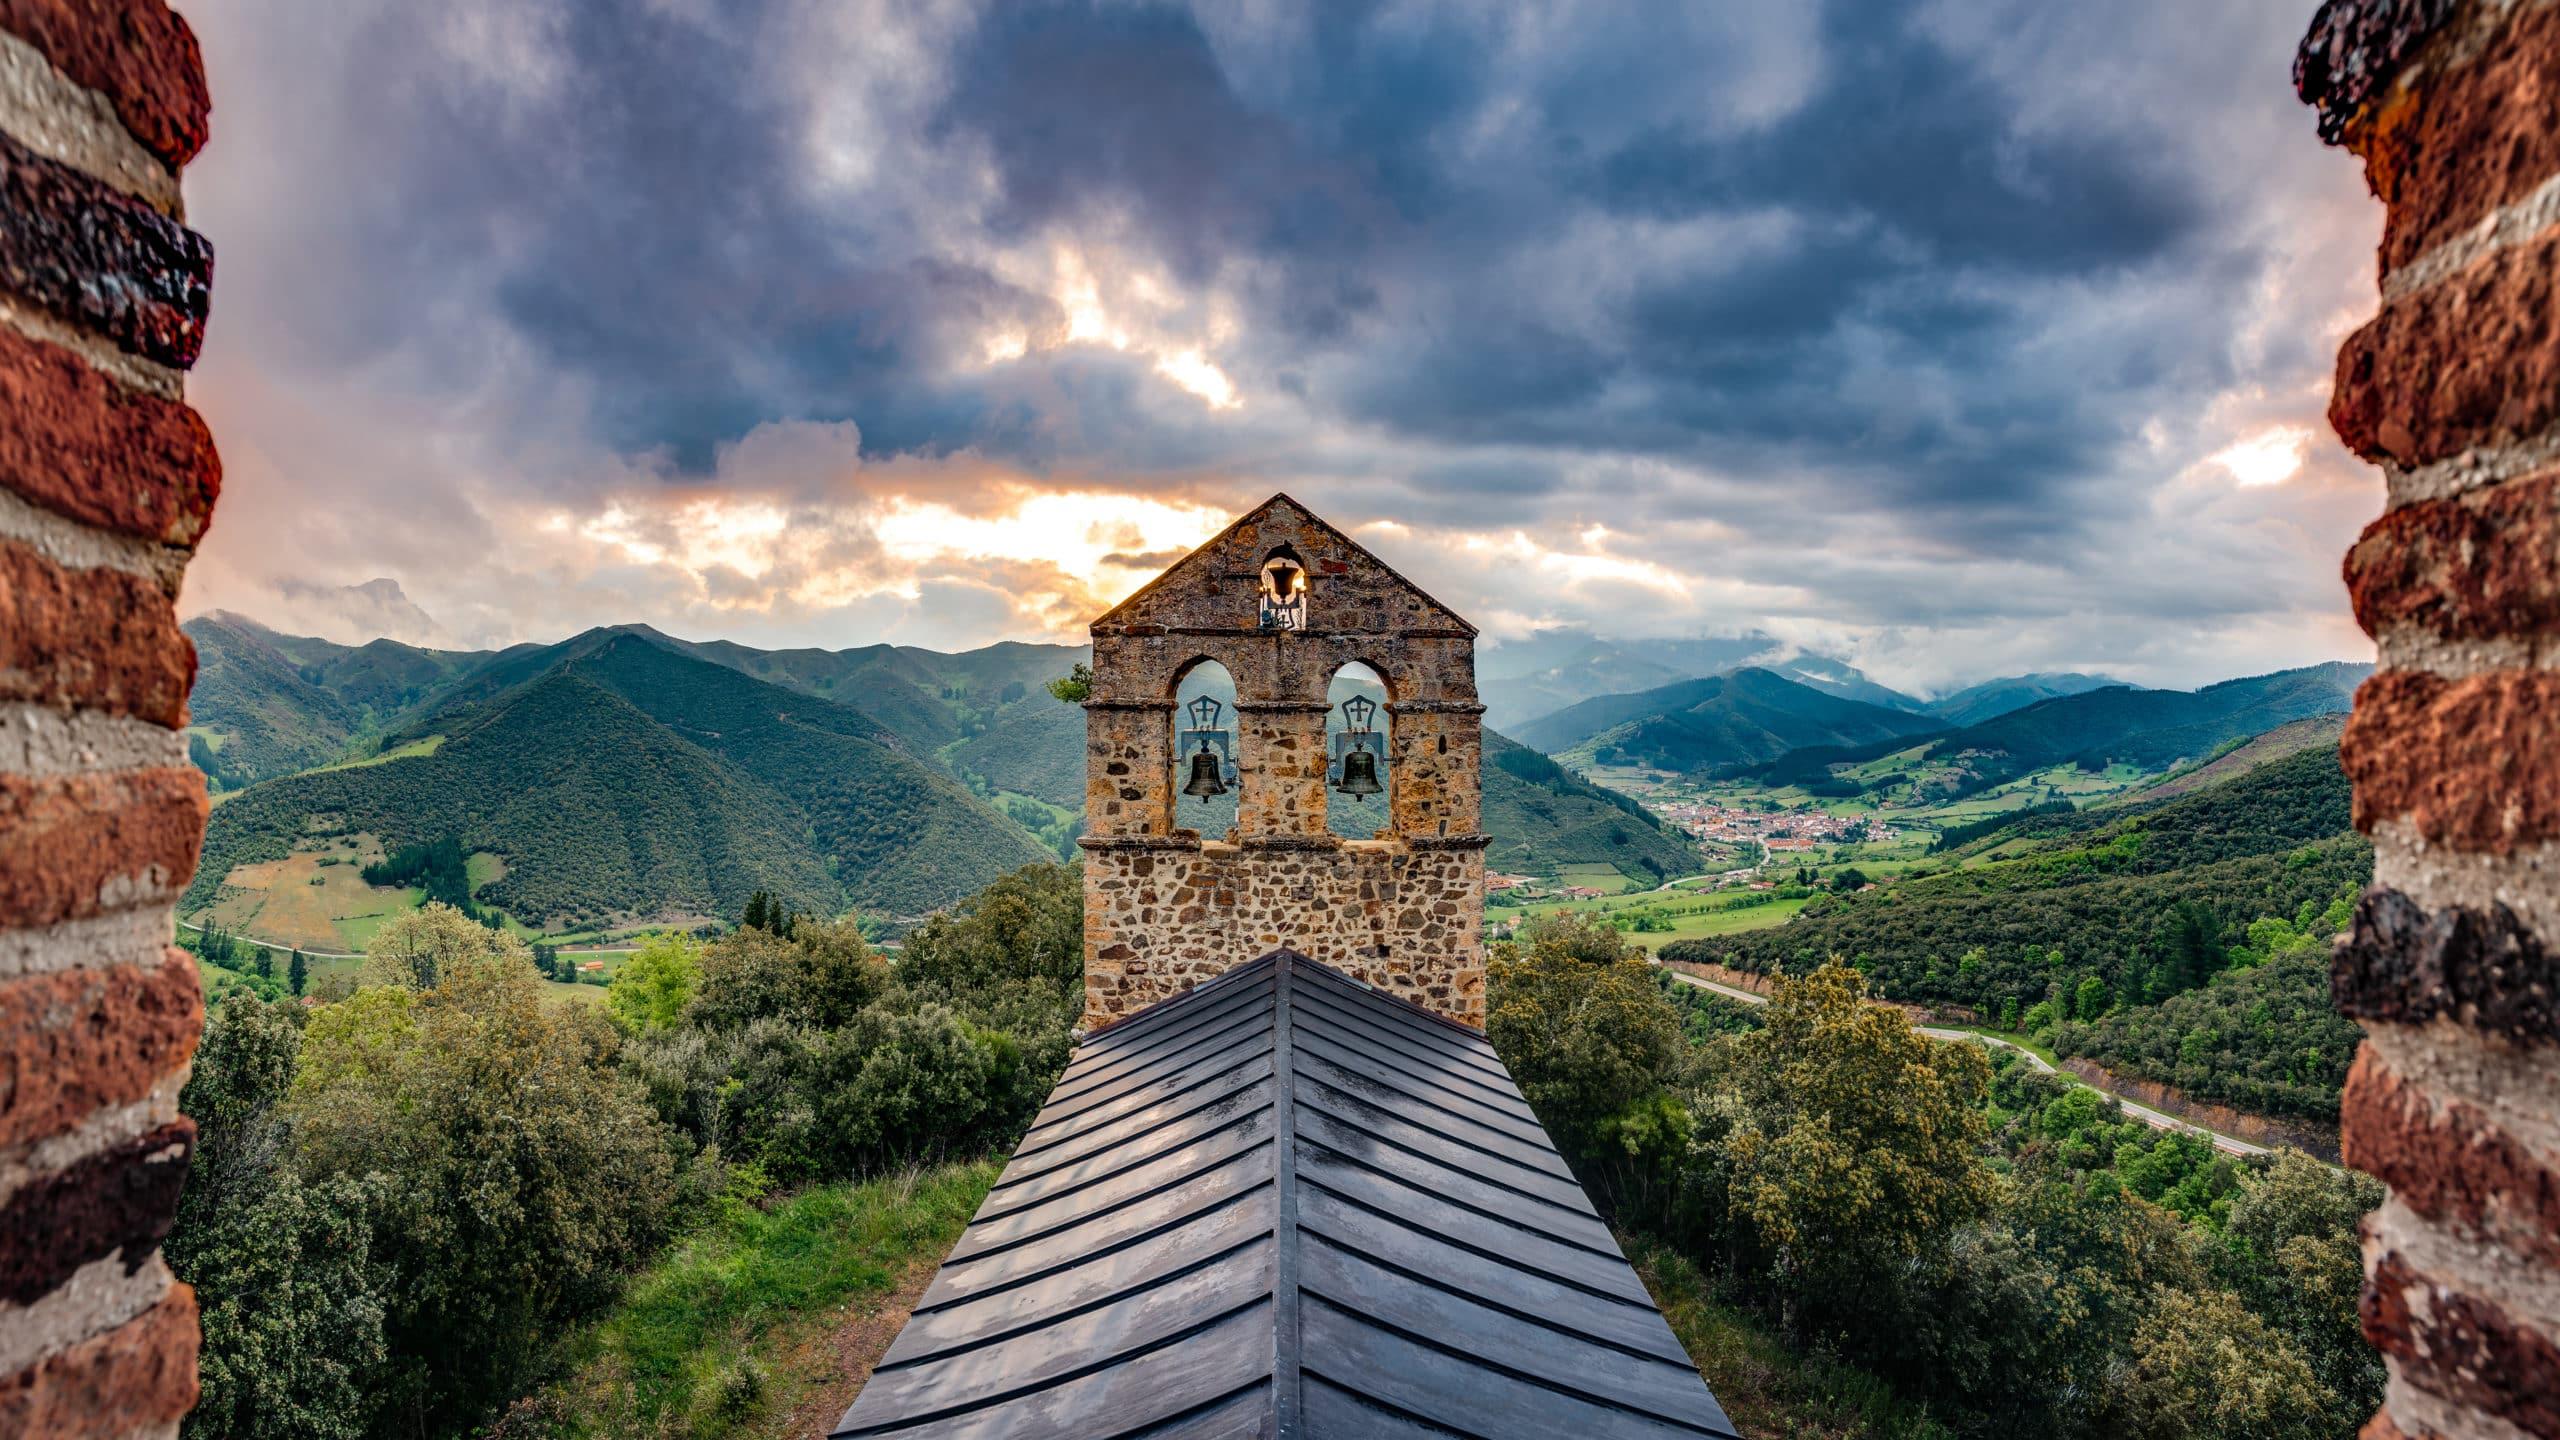 Iglesia San Miguel en Potes, Cantabria